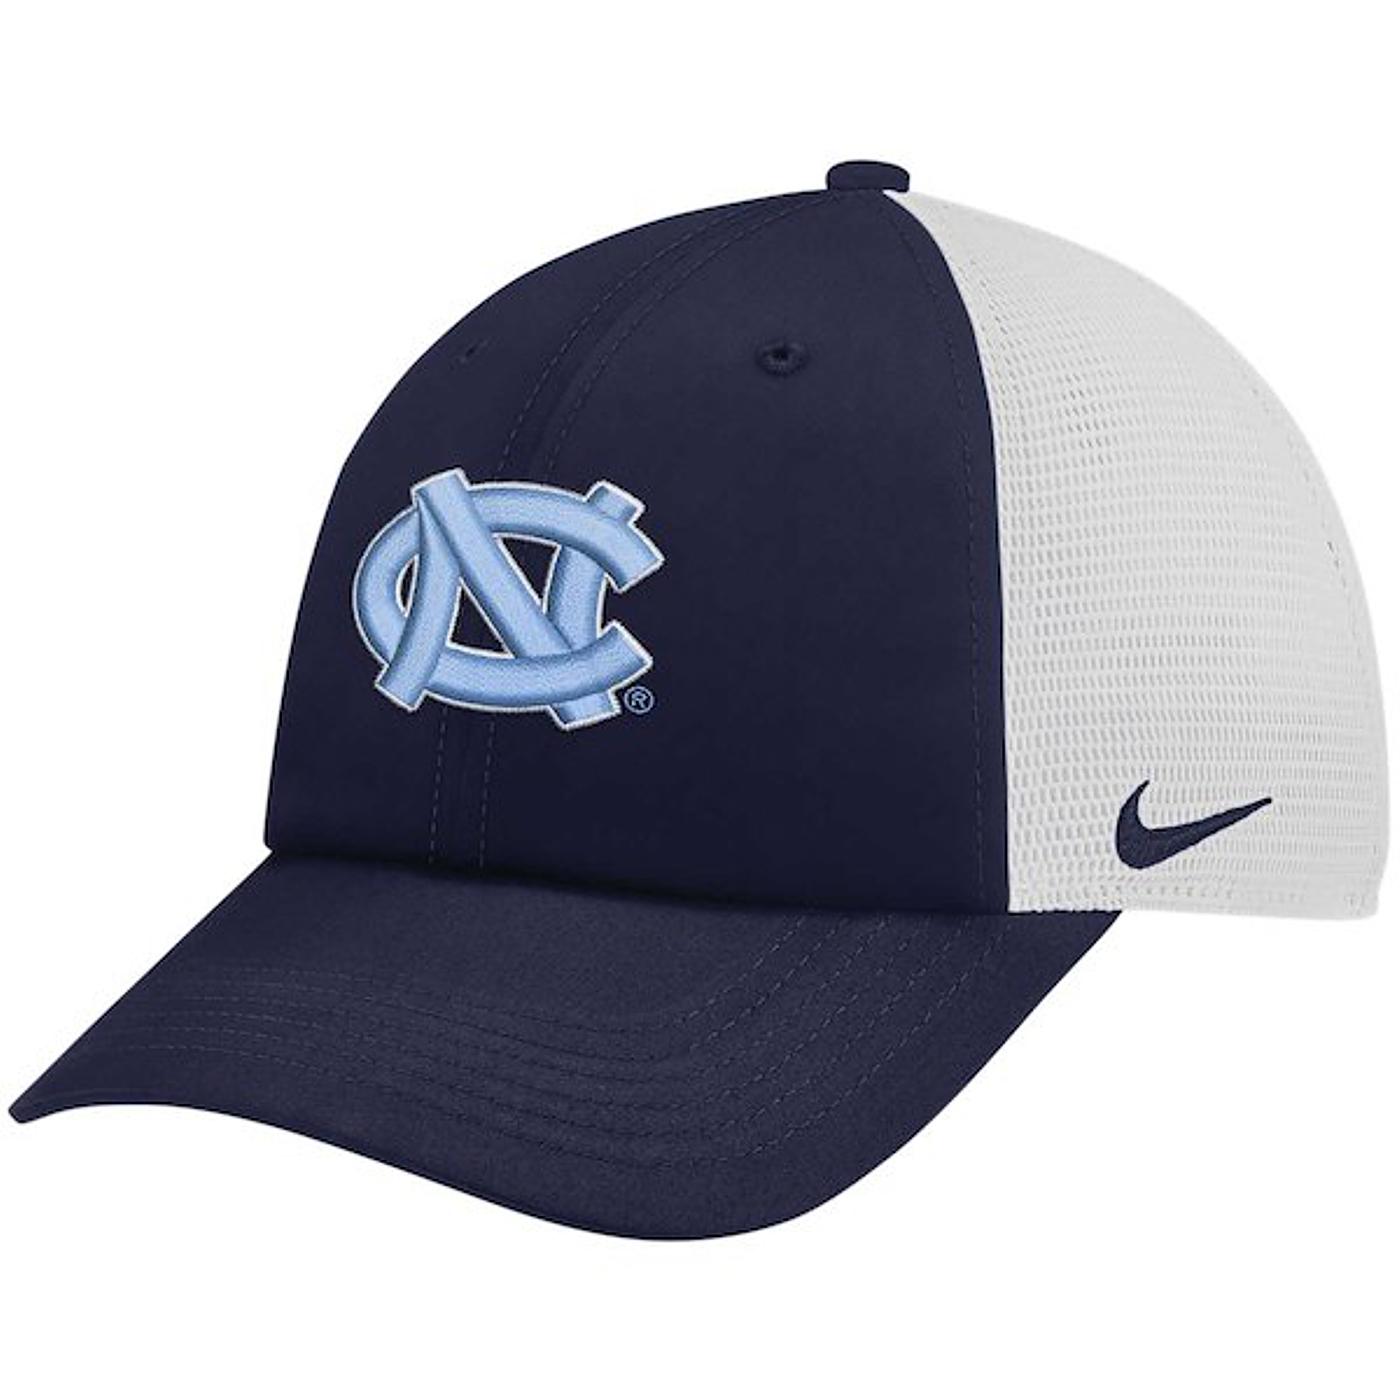 7cc35fbf718 Johnny T-shirt - North Carolina Tar Heels - Nike Heritage86 Mesh Trucker Hat  (Navy White) by Nike